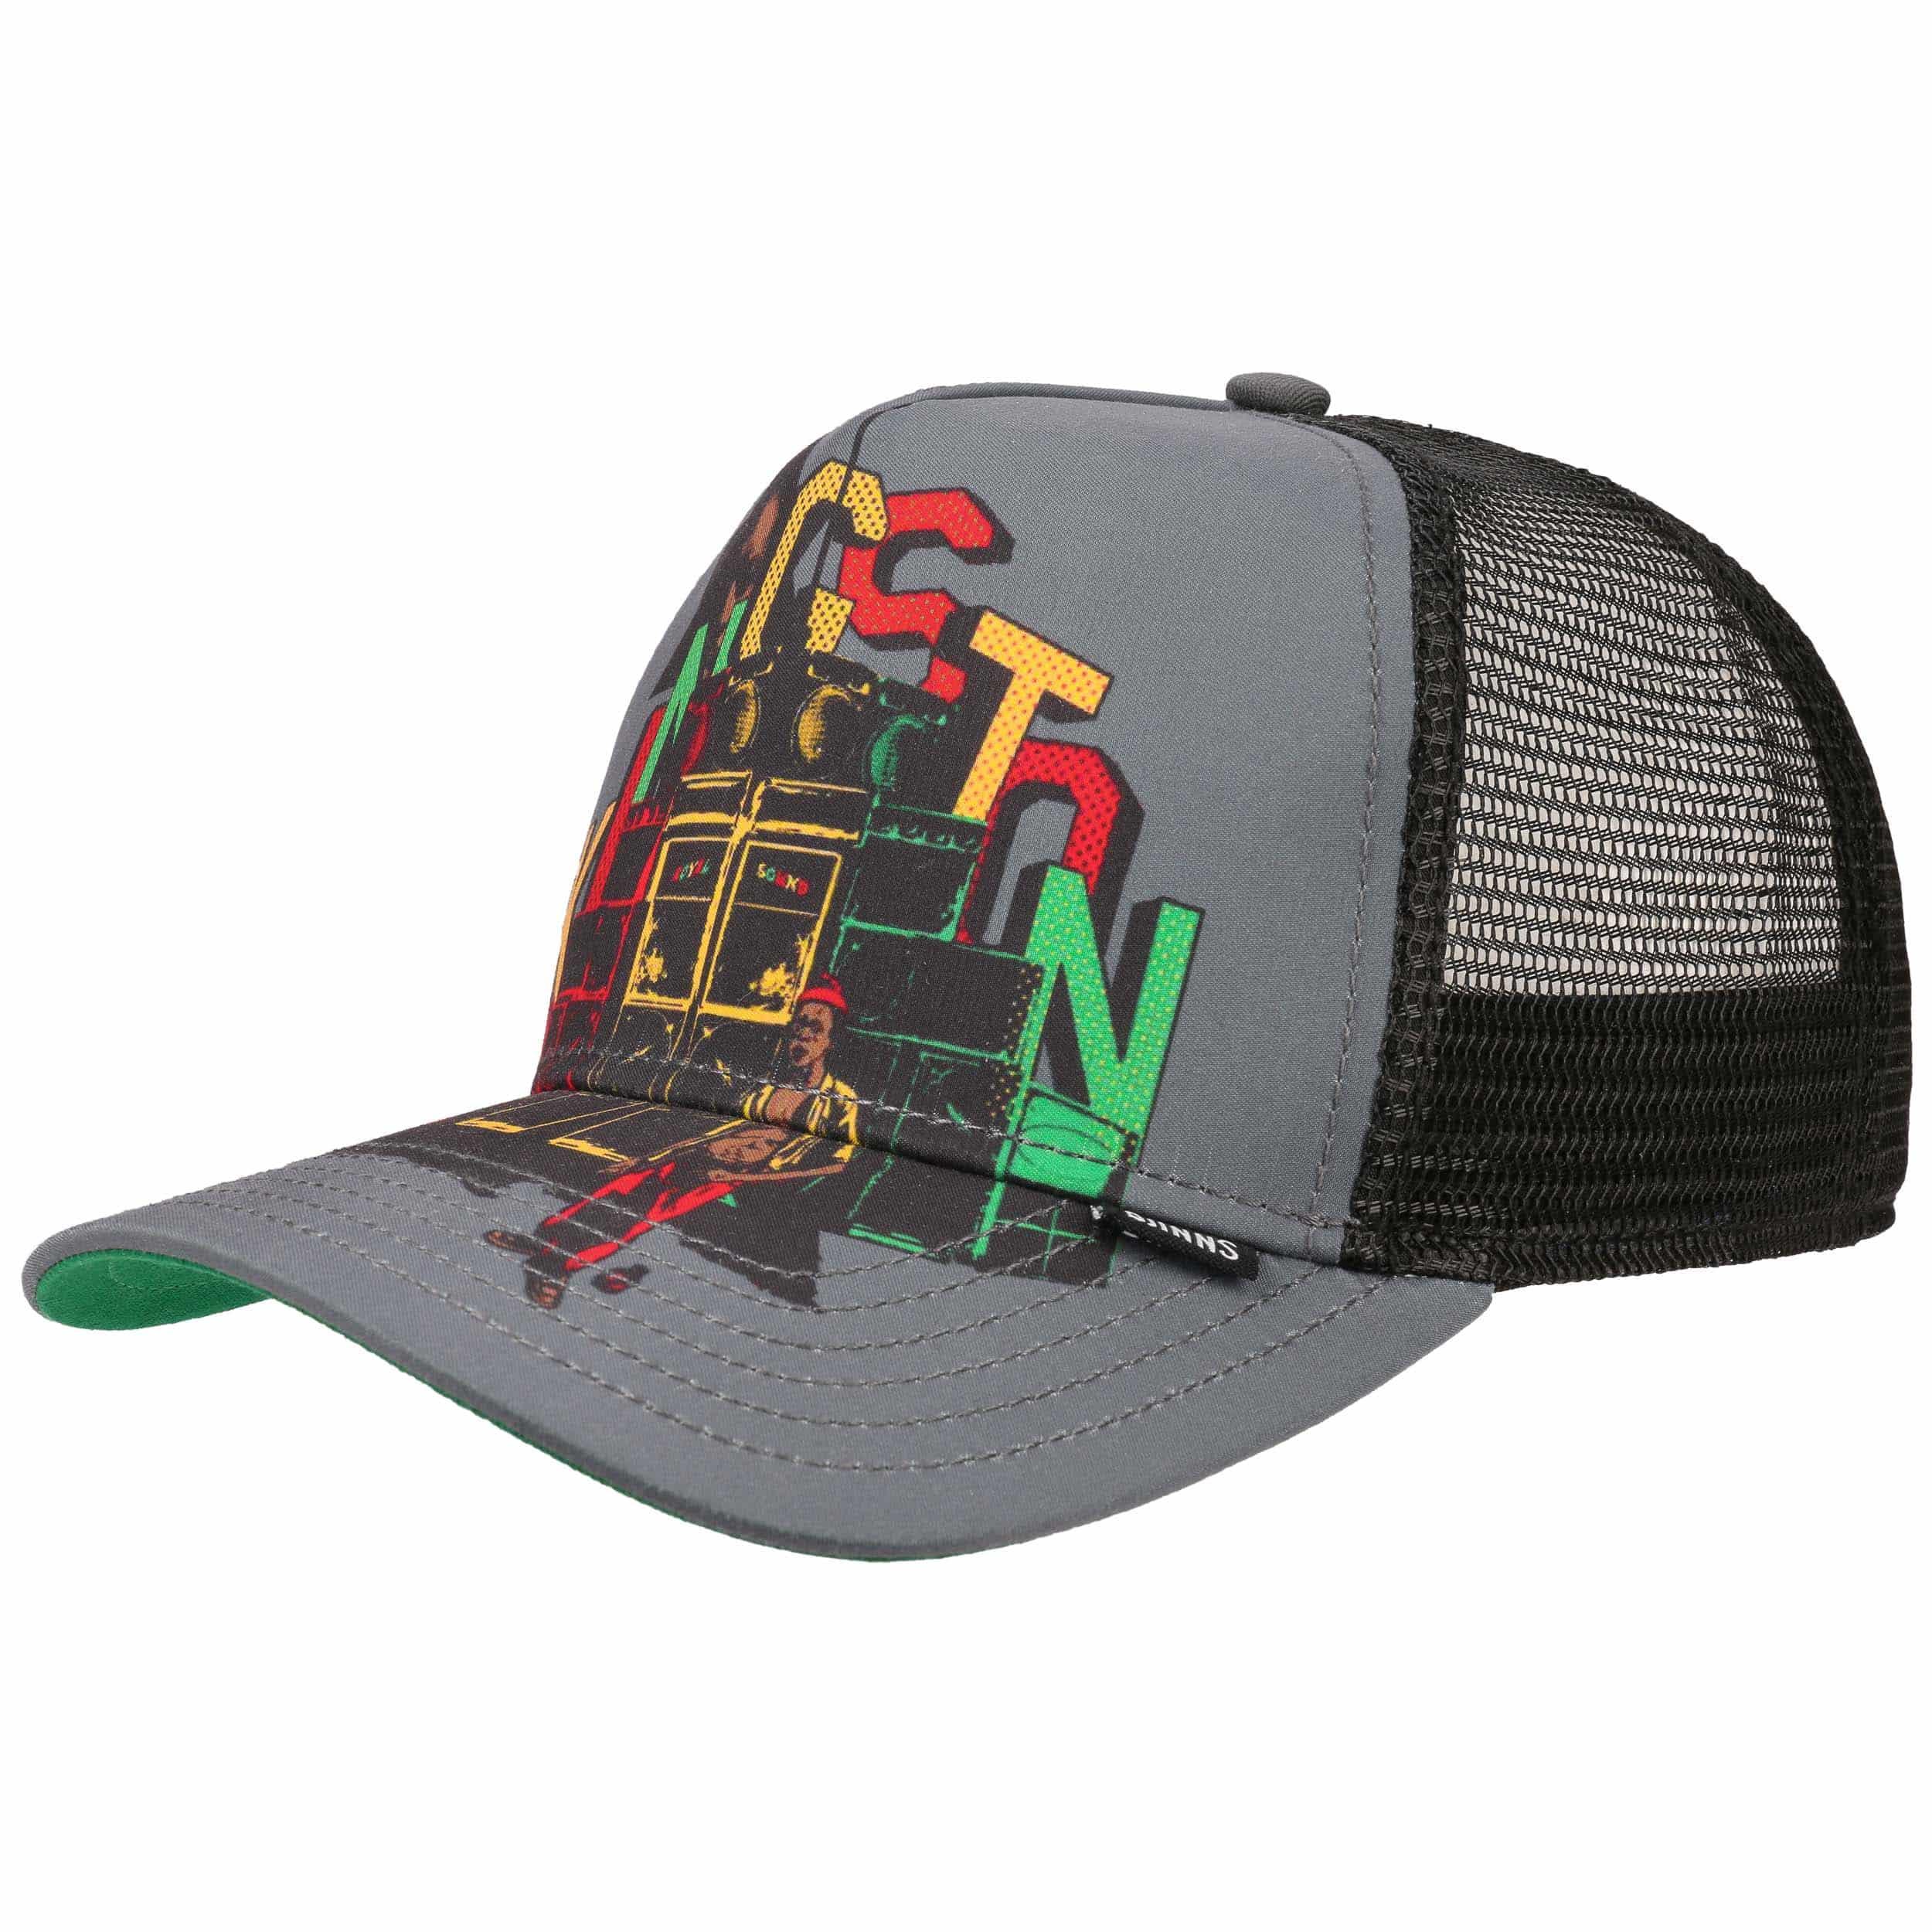 kingston hft 101 trucker cap by djinns gbp 22 95 hats. Black Bedroom Furniture Sets. Home Design Ideas